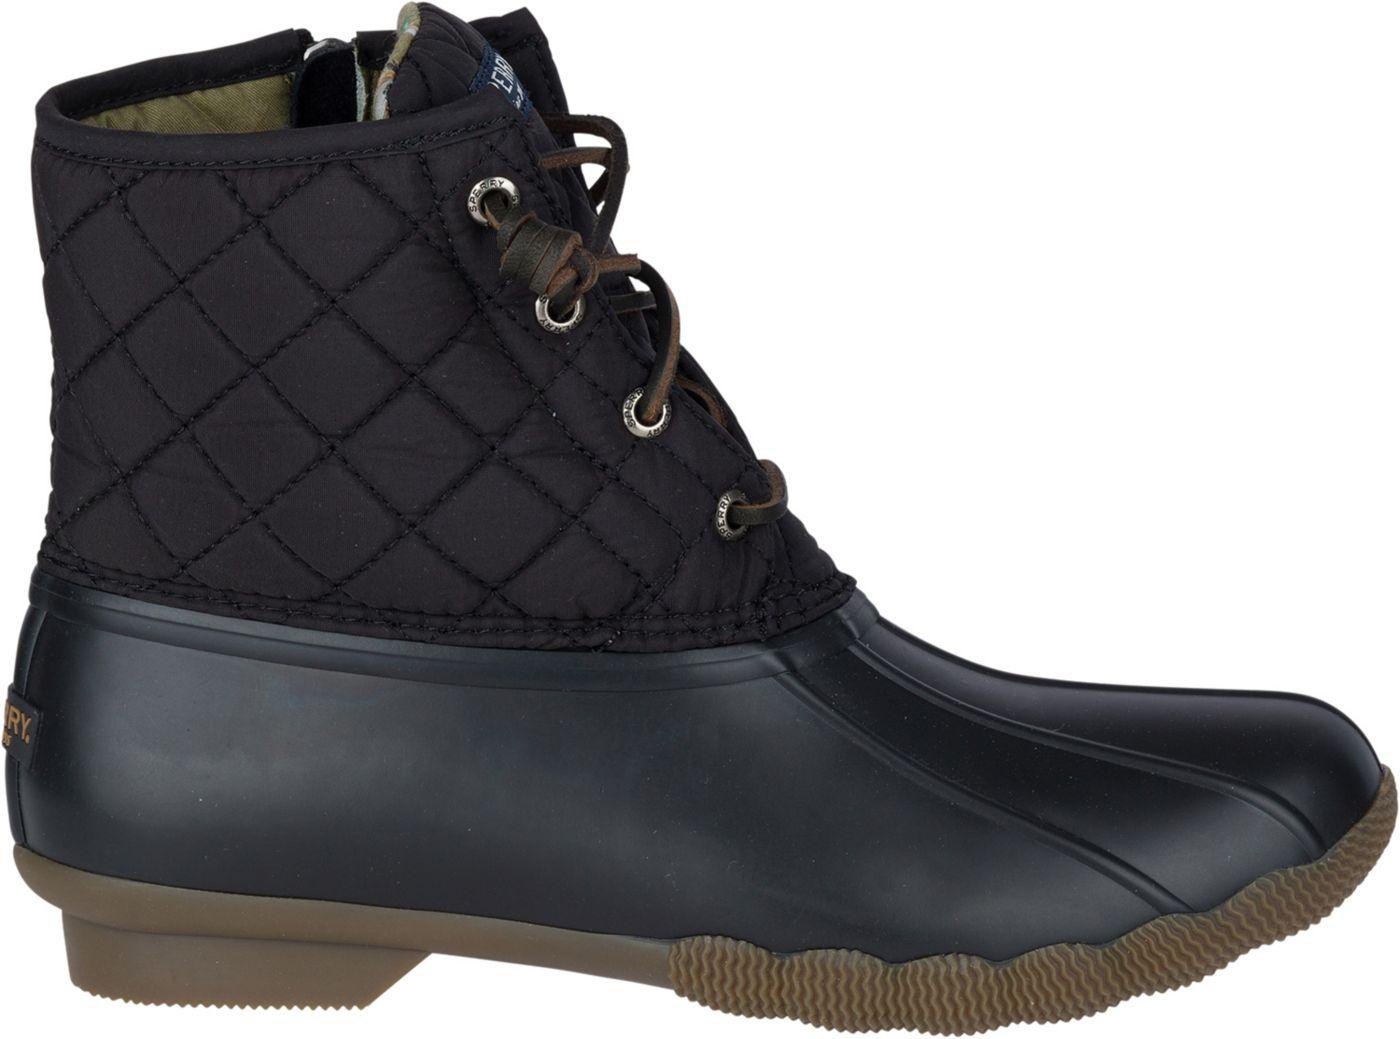 Sperry Women's Saltwater Quilted Waterproof Winter Boots